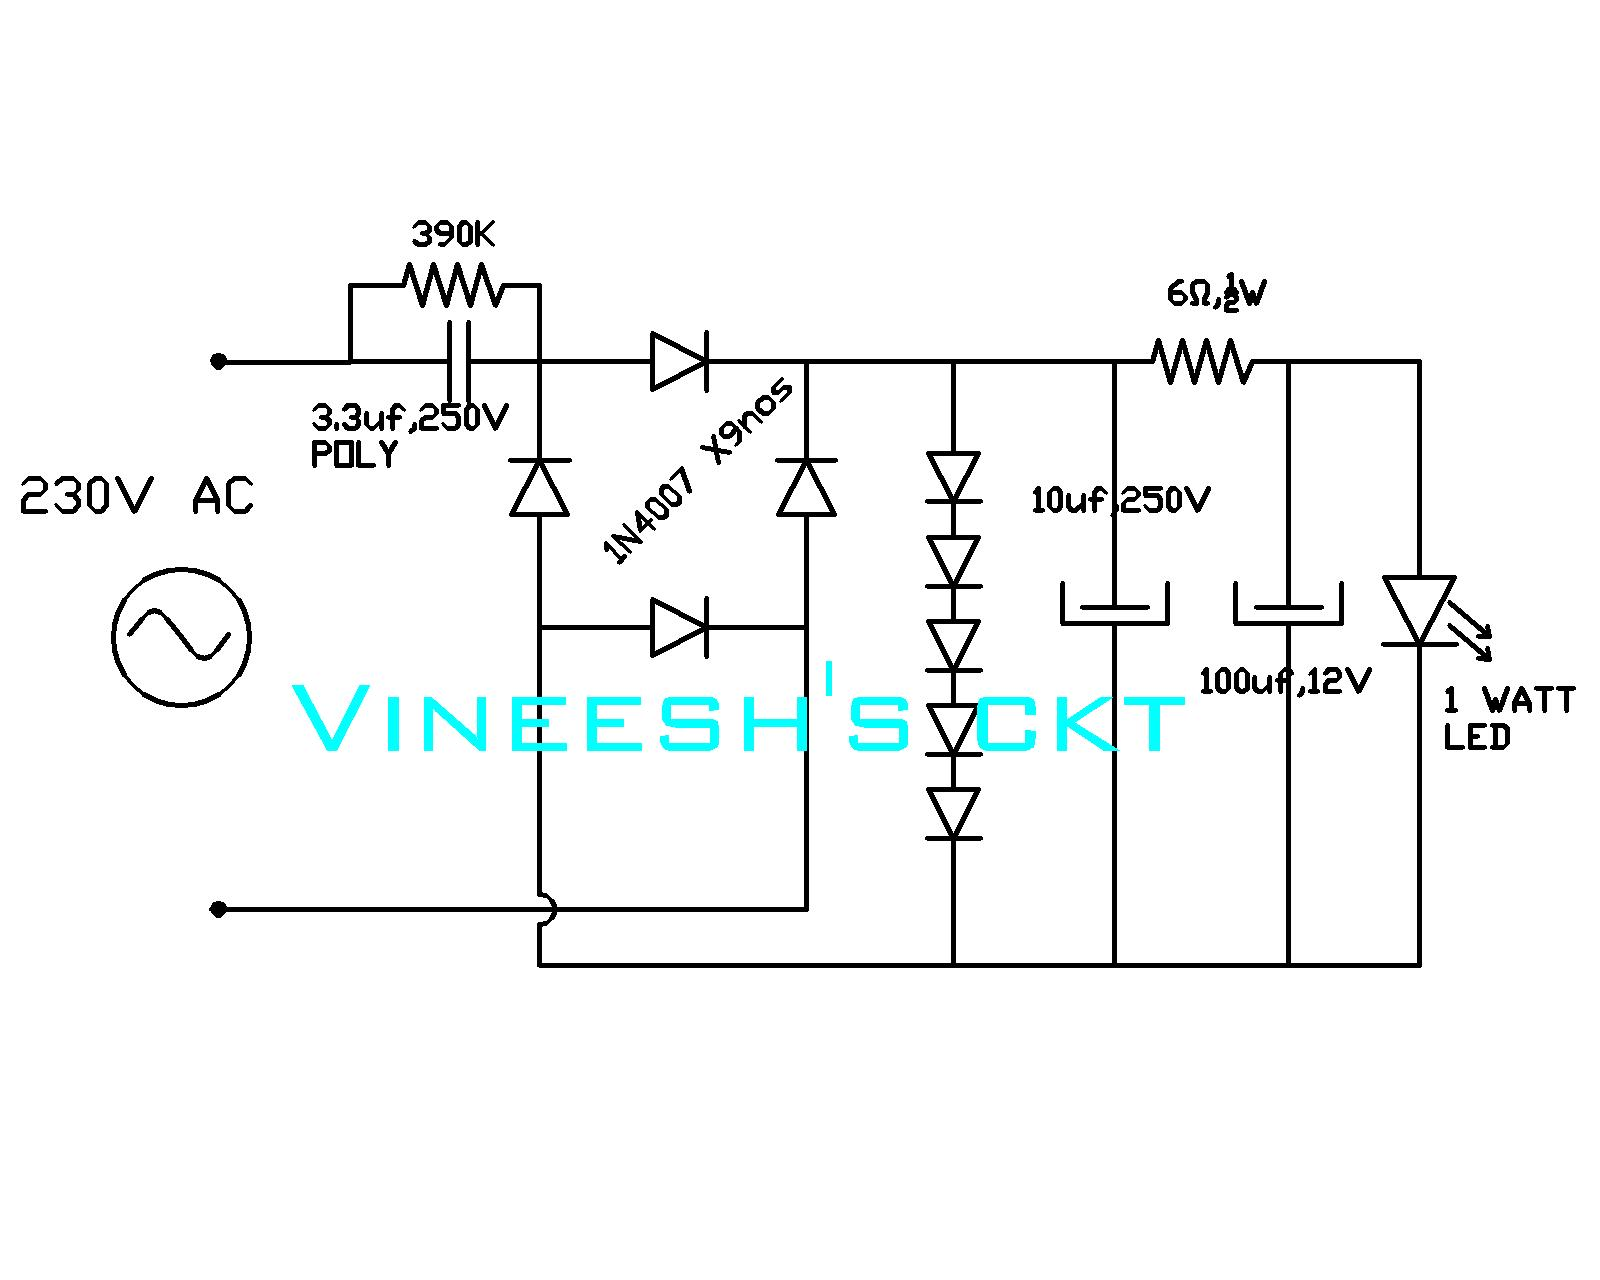 led lamp driver circuit diagram 120v contactor wiring simple circuits vineetron 230v to 1 watt